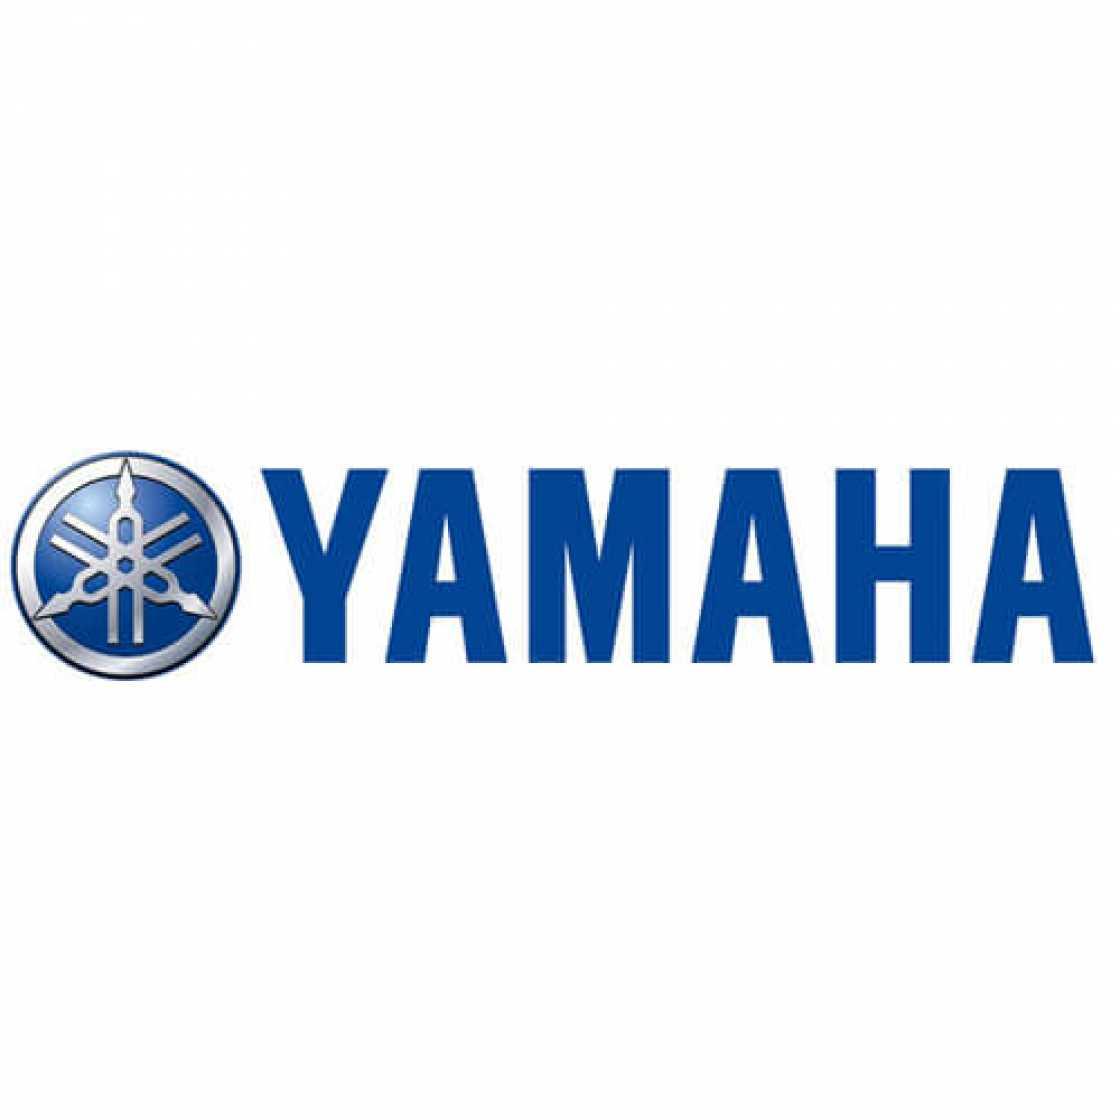 Yamaha studio speakers